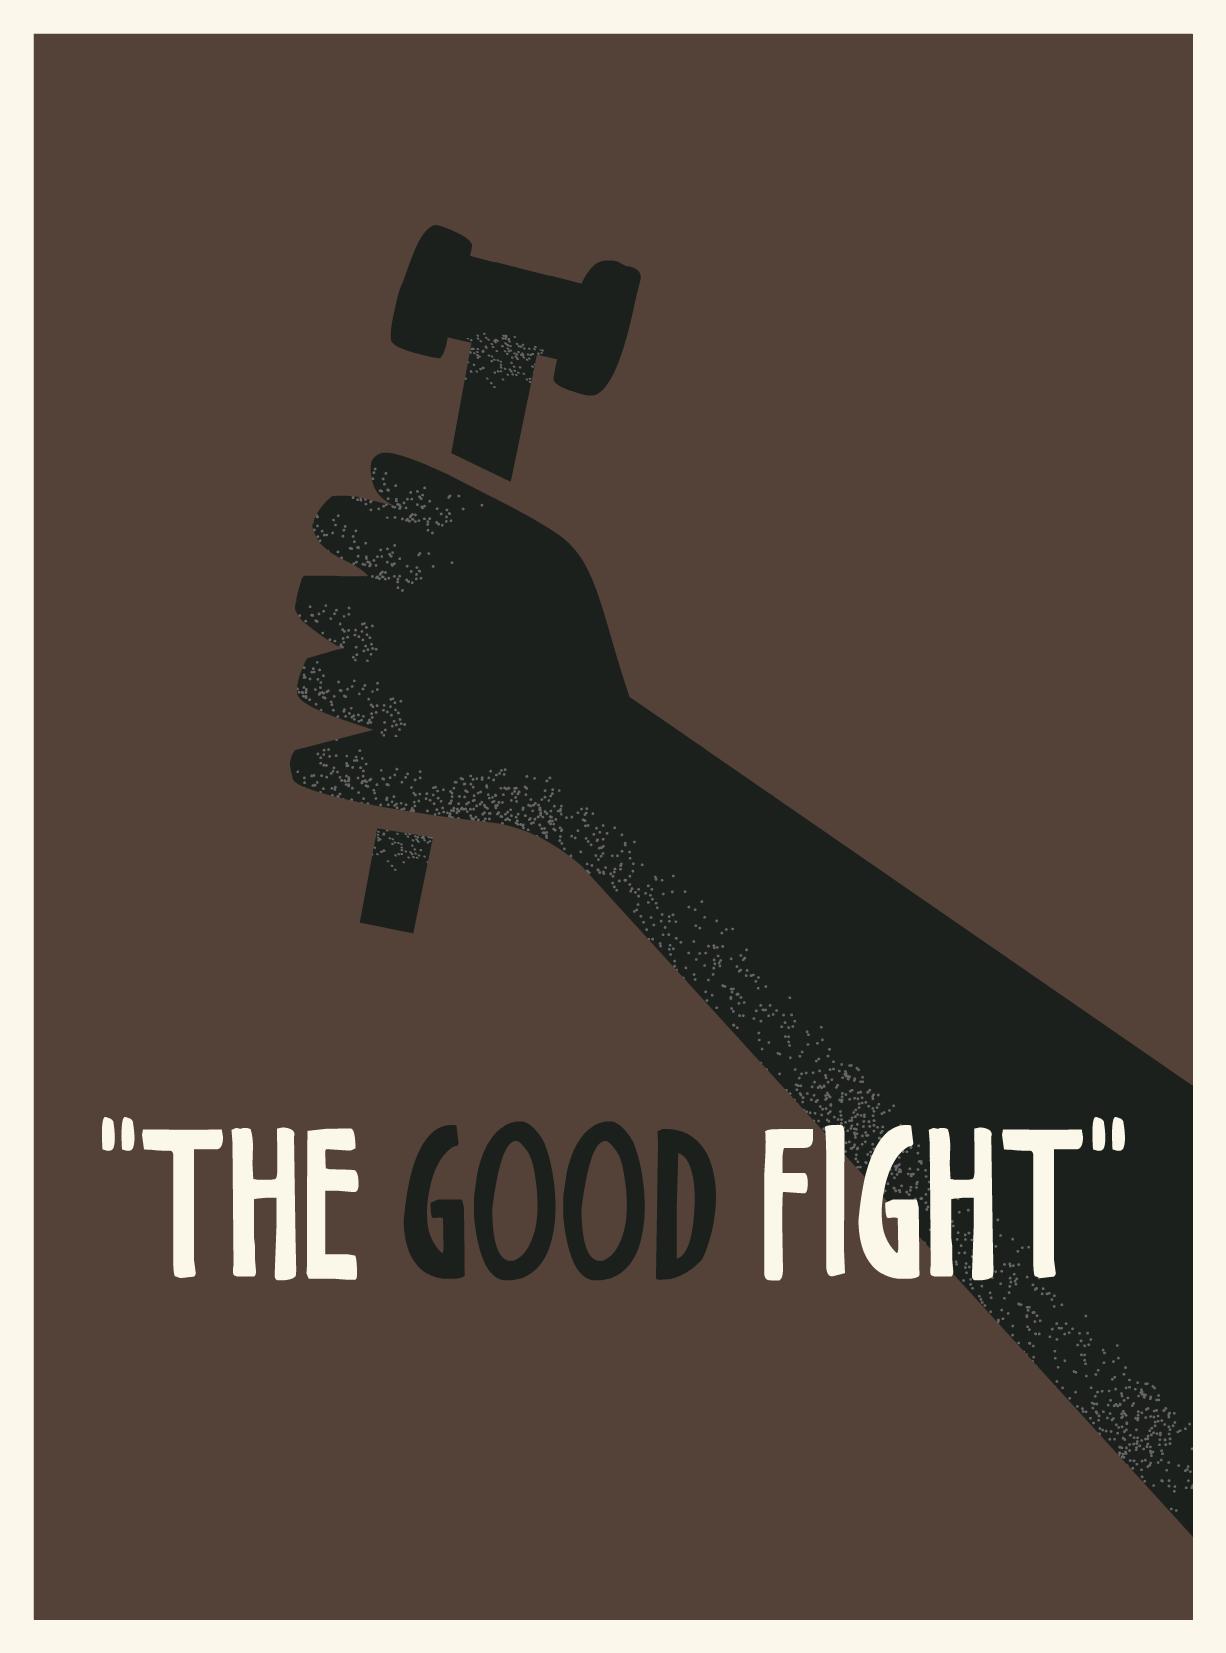 thegoodfight_saulbass30003